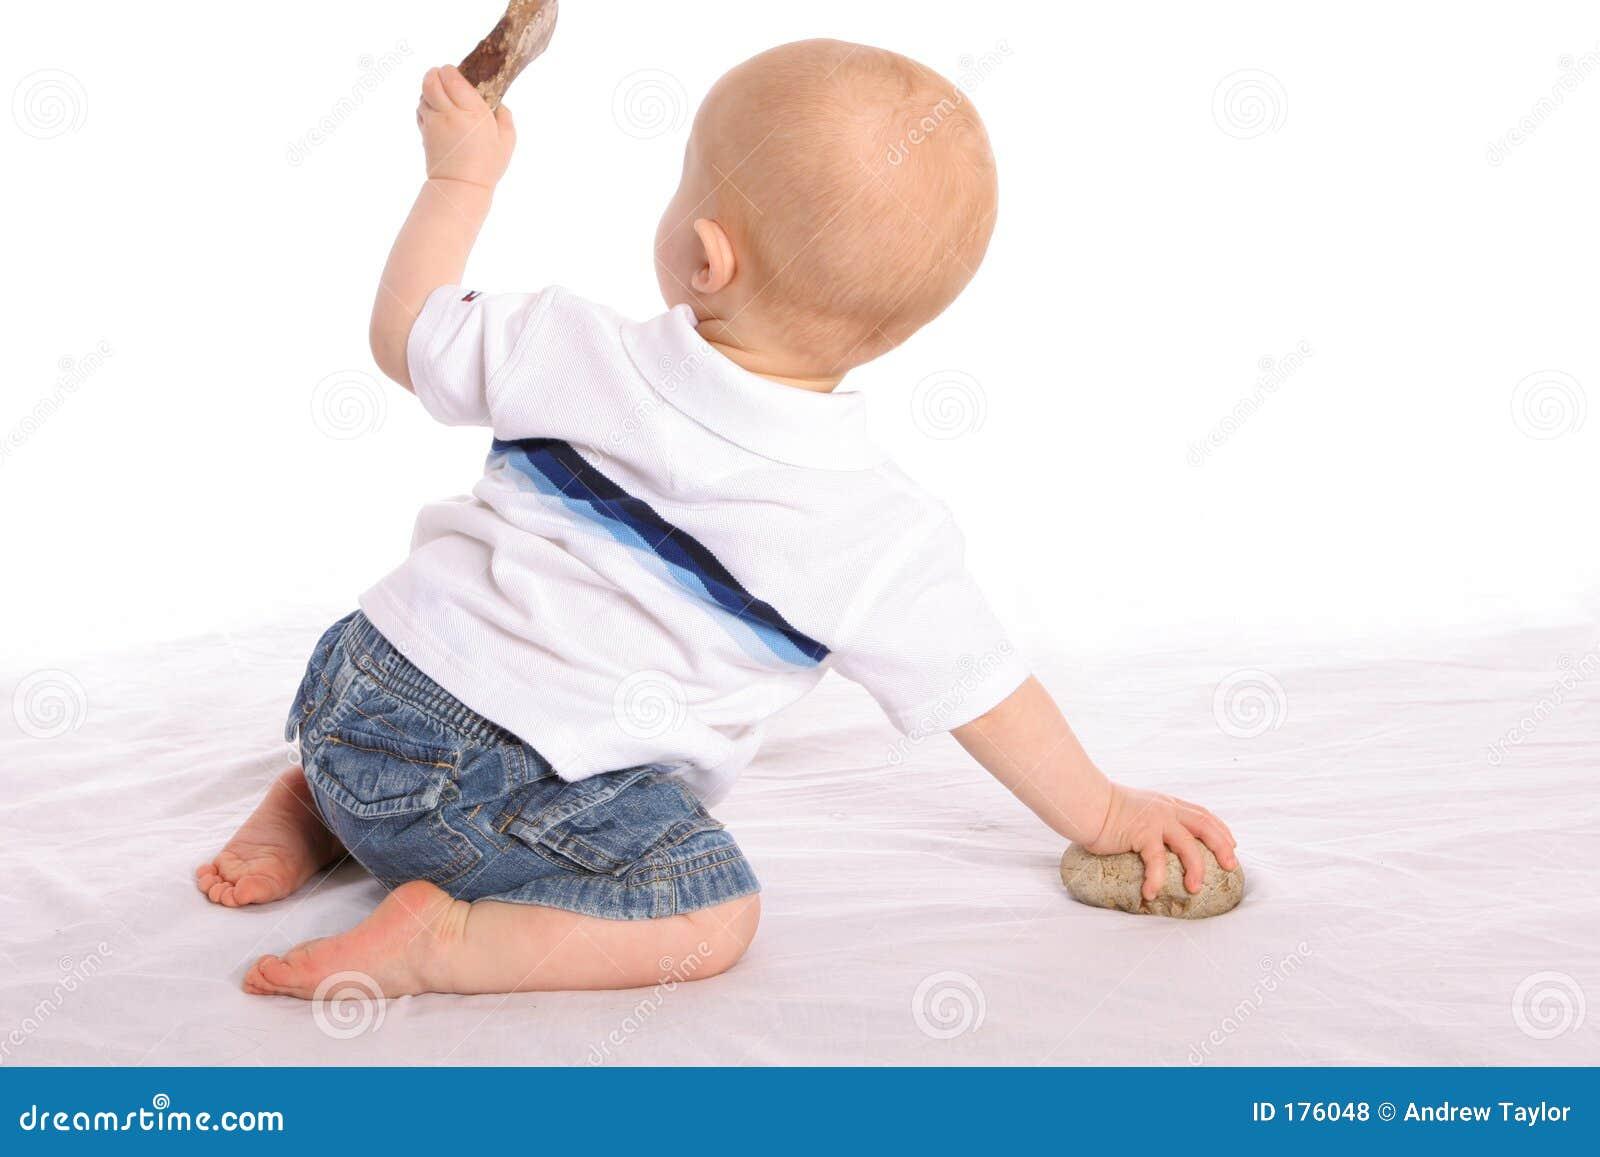 Download 小地质学家一 库存照片. 图片 包括有 使用, 地质, 婴孩, 采用的, 爬行, 少许, 男朋友, 作用, 孩子 - 176048